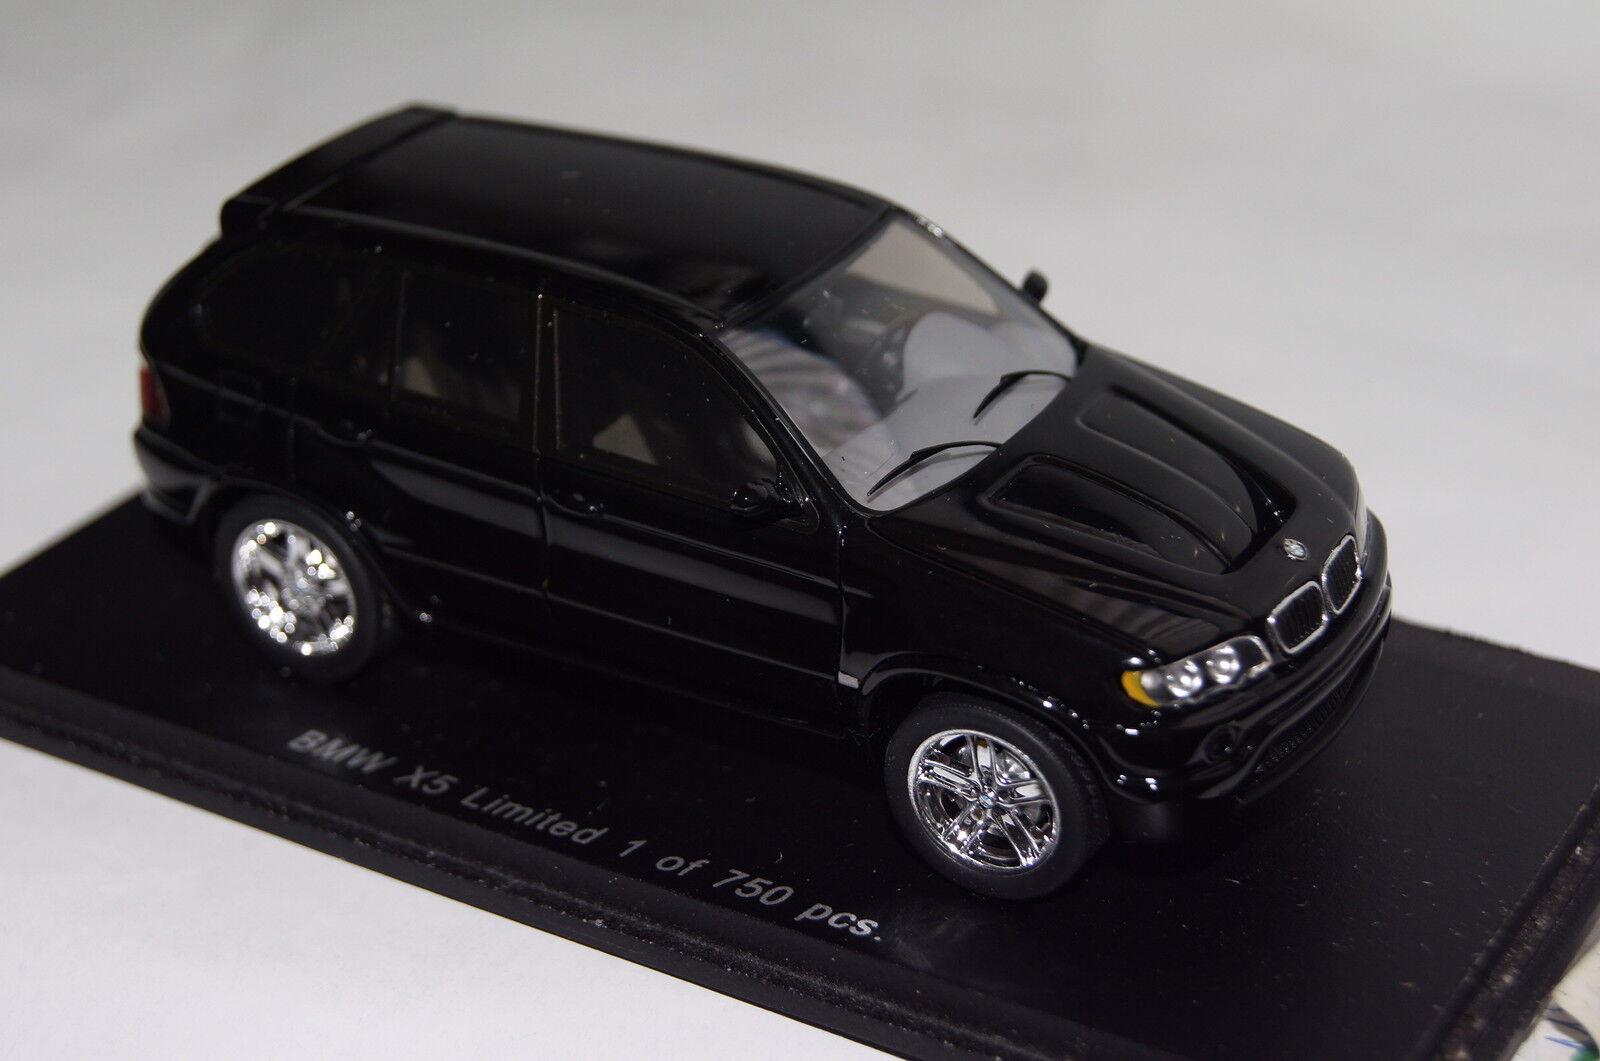 BMW X5 schwarz 1 43 Spark neu & OVP  | Viele Stile